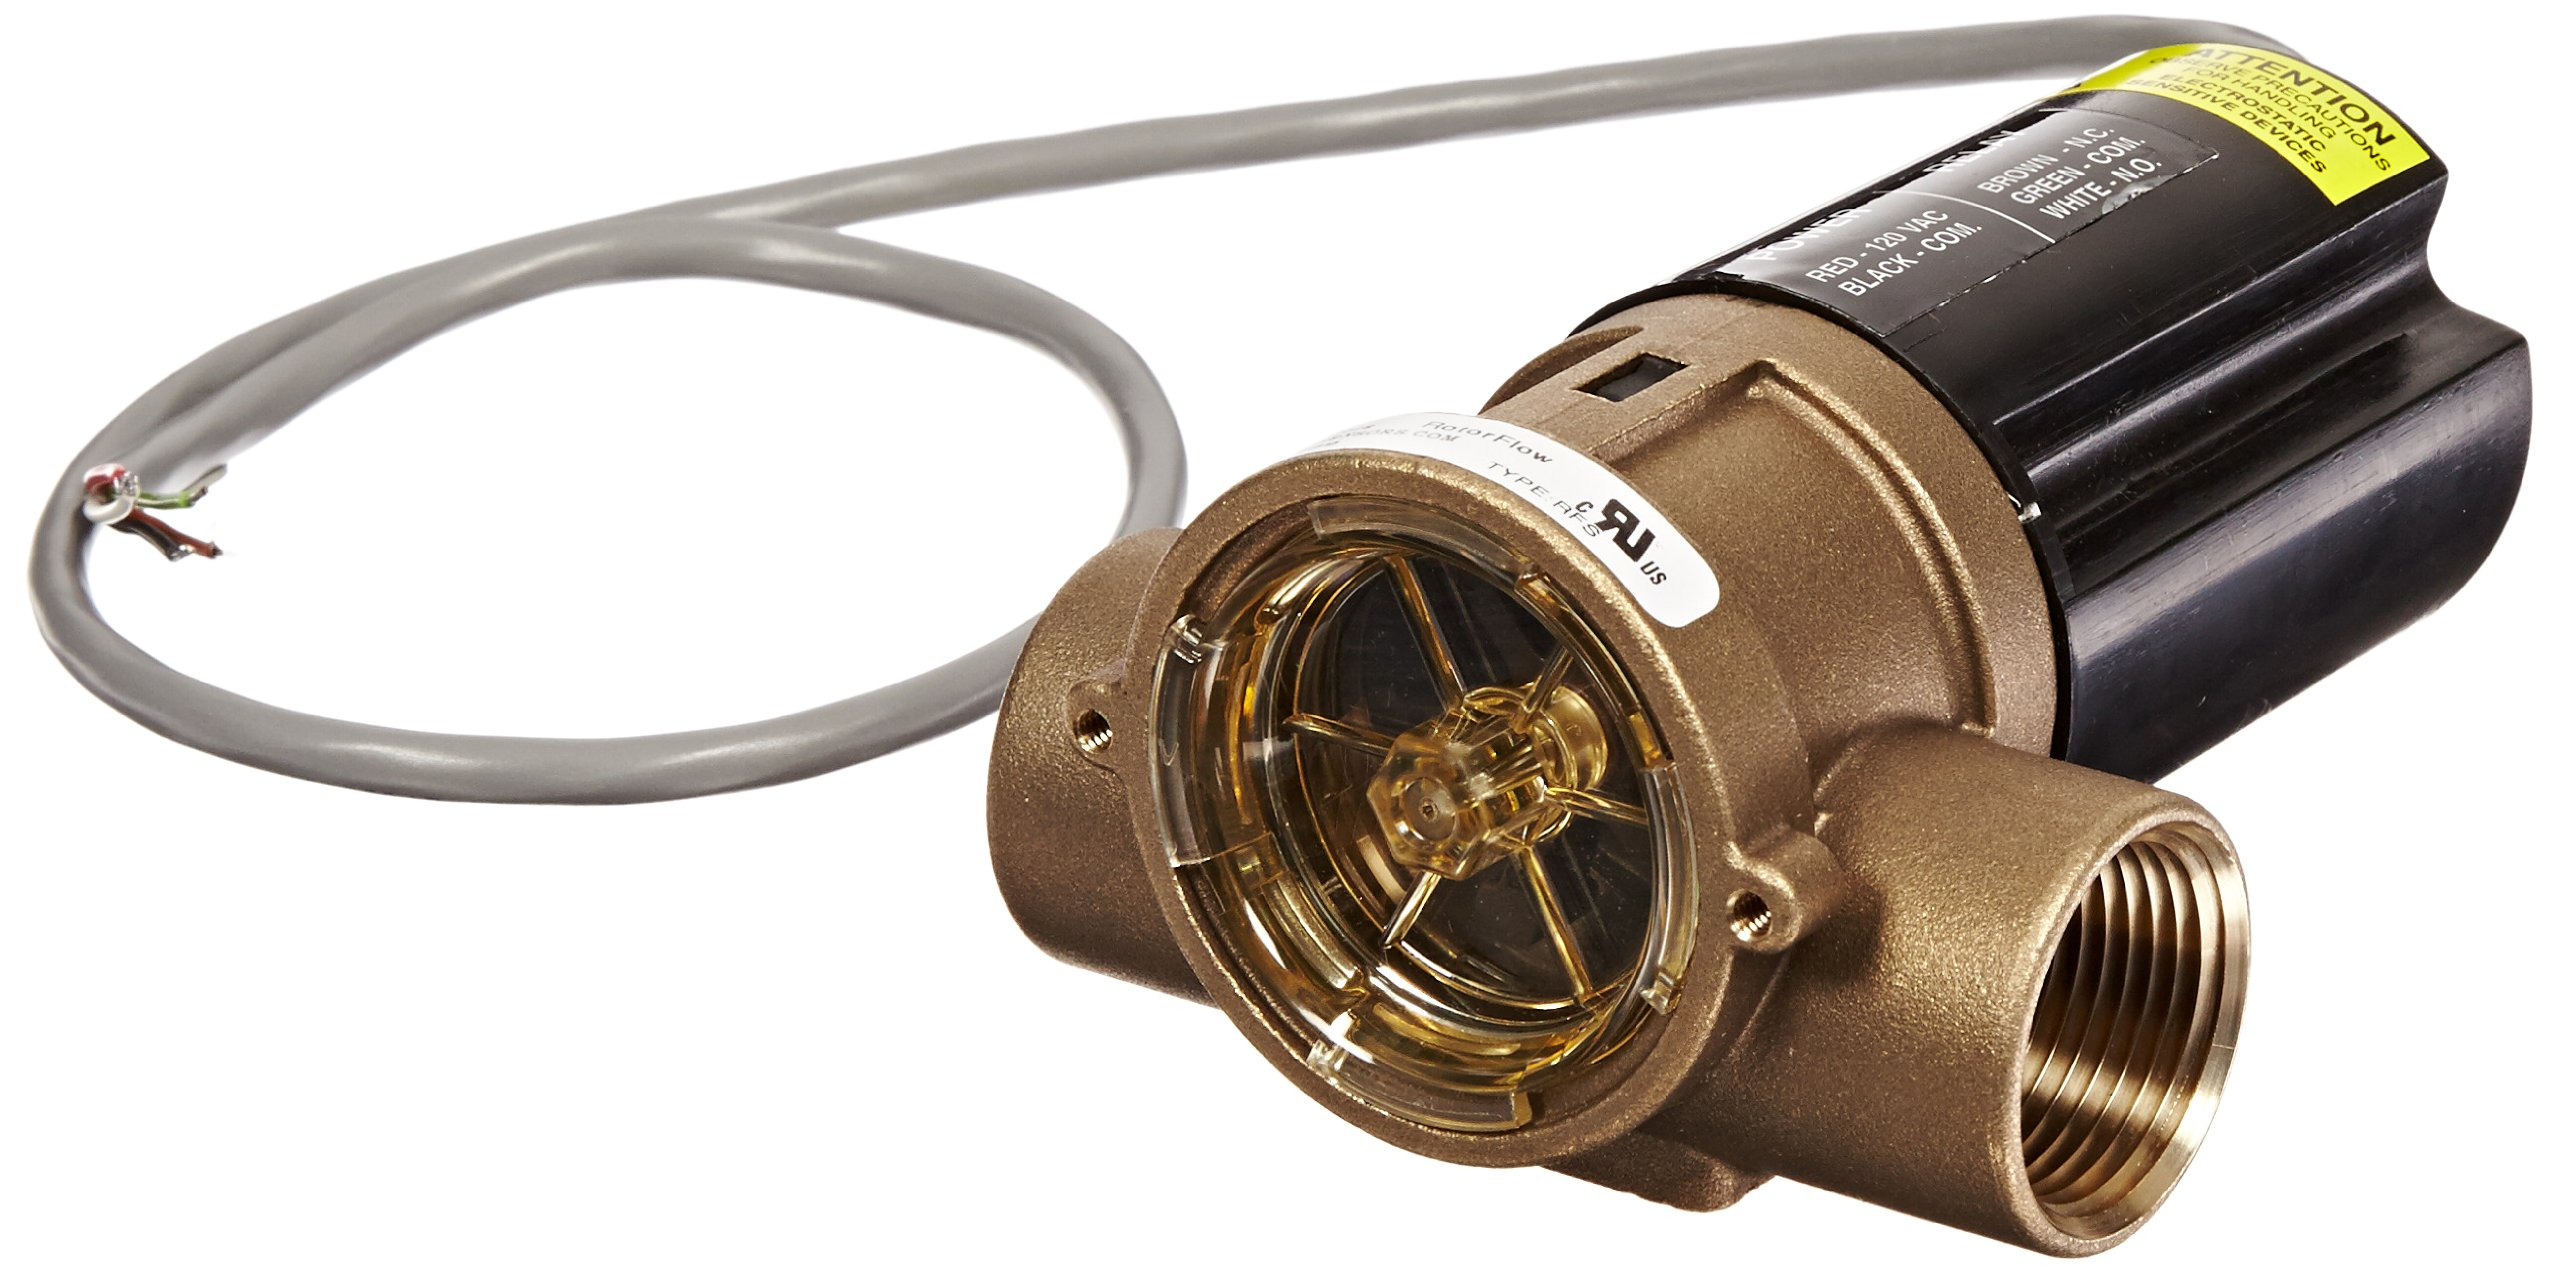 Gems Sensors RFS Series Brass Flow Sensor Switch, Inline, Rotor Type, 115 VAC Input, 8.0 - 60.0 gpm Flow Setting Adjustment Range, 1'' NPT Female